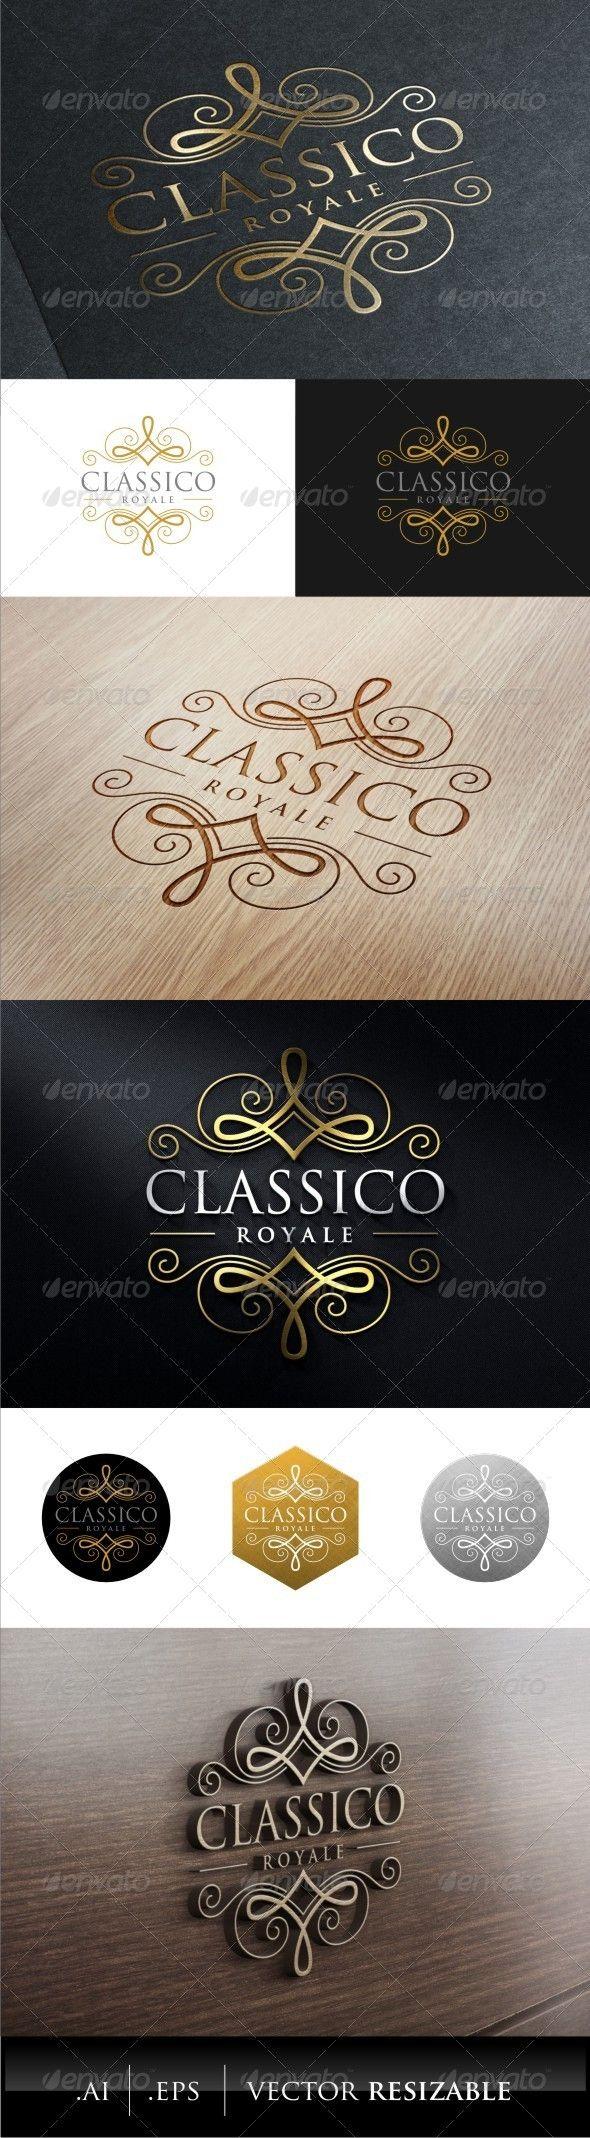 Classic Royal Logo Template #design #logotype Download: http://graphicriver.net/item/classic-royal-logo/7879641?ref=ksioks